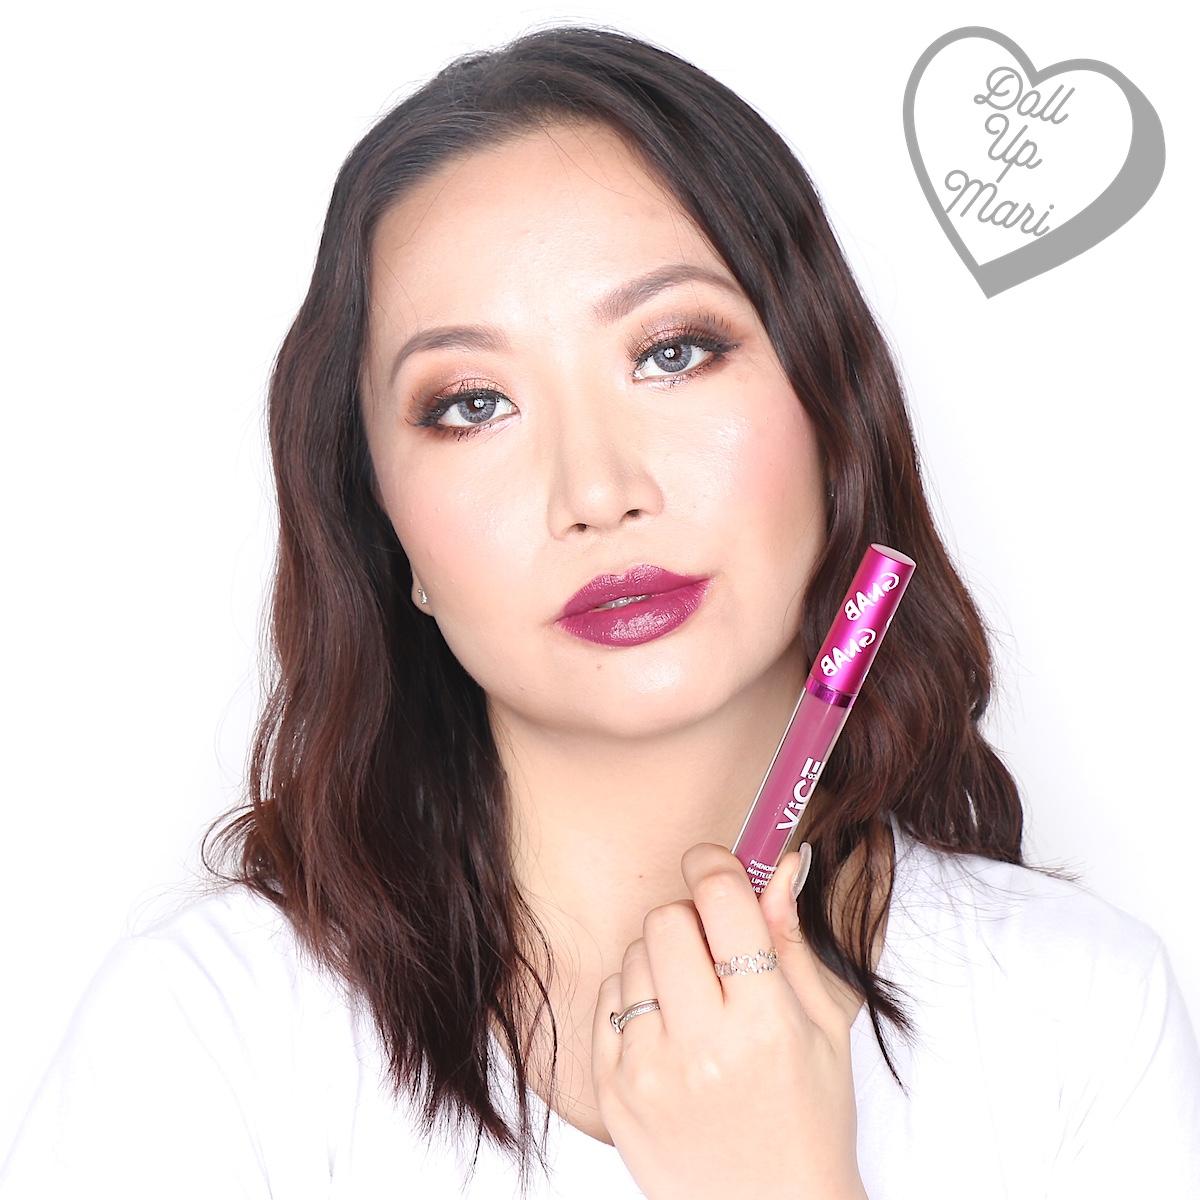 Mari wearing the Matte Liquid Lipstick of the Rrrahmpa set of Vice X Bang Lip set collection